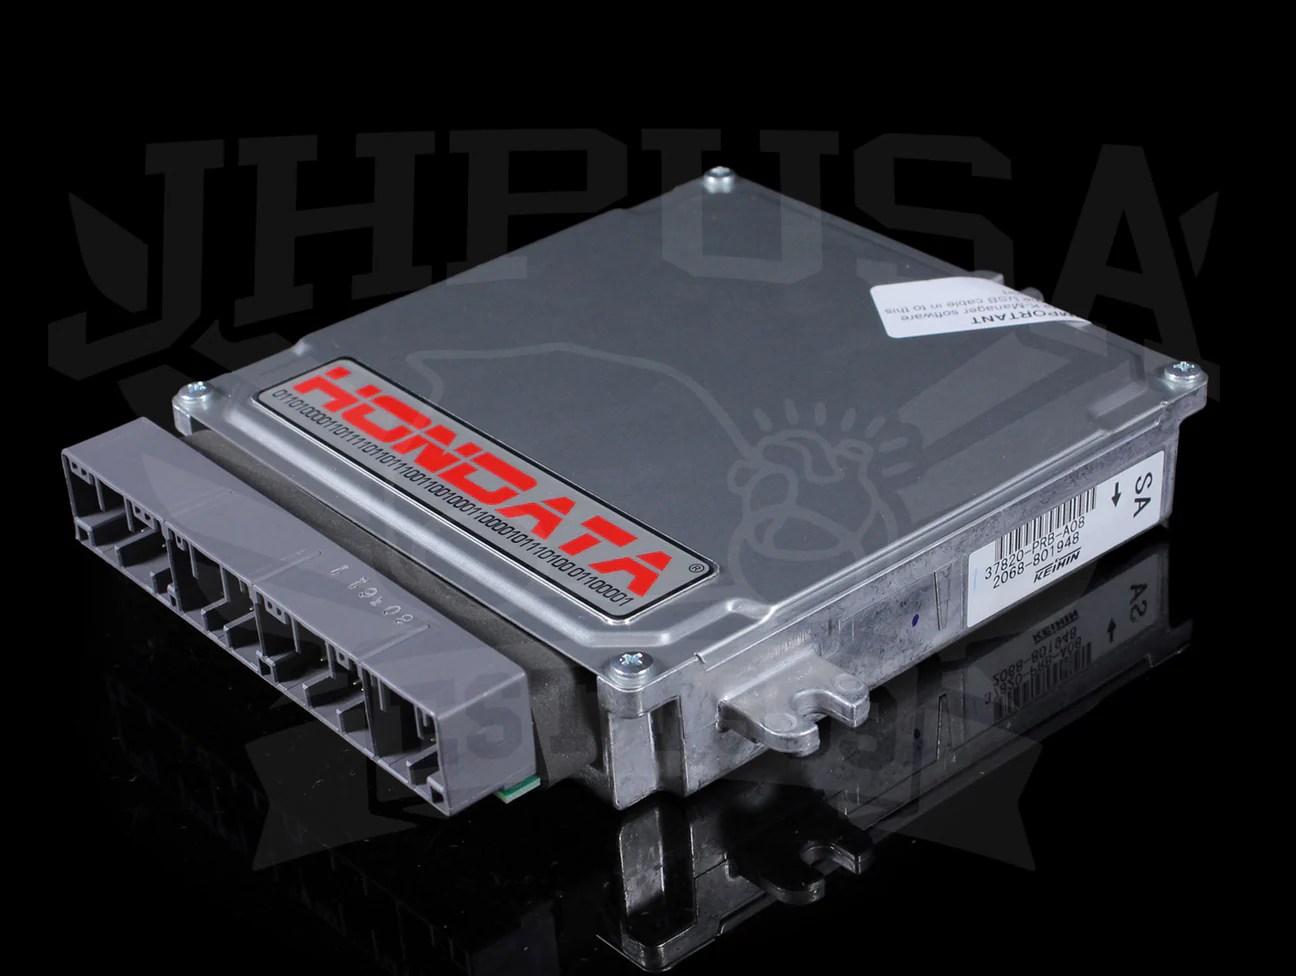 hondata k pro s2000 with ecu 00 05 s2000  [ 1296 x 976 Pixel ]